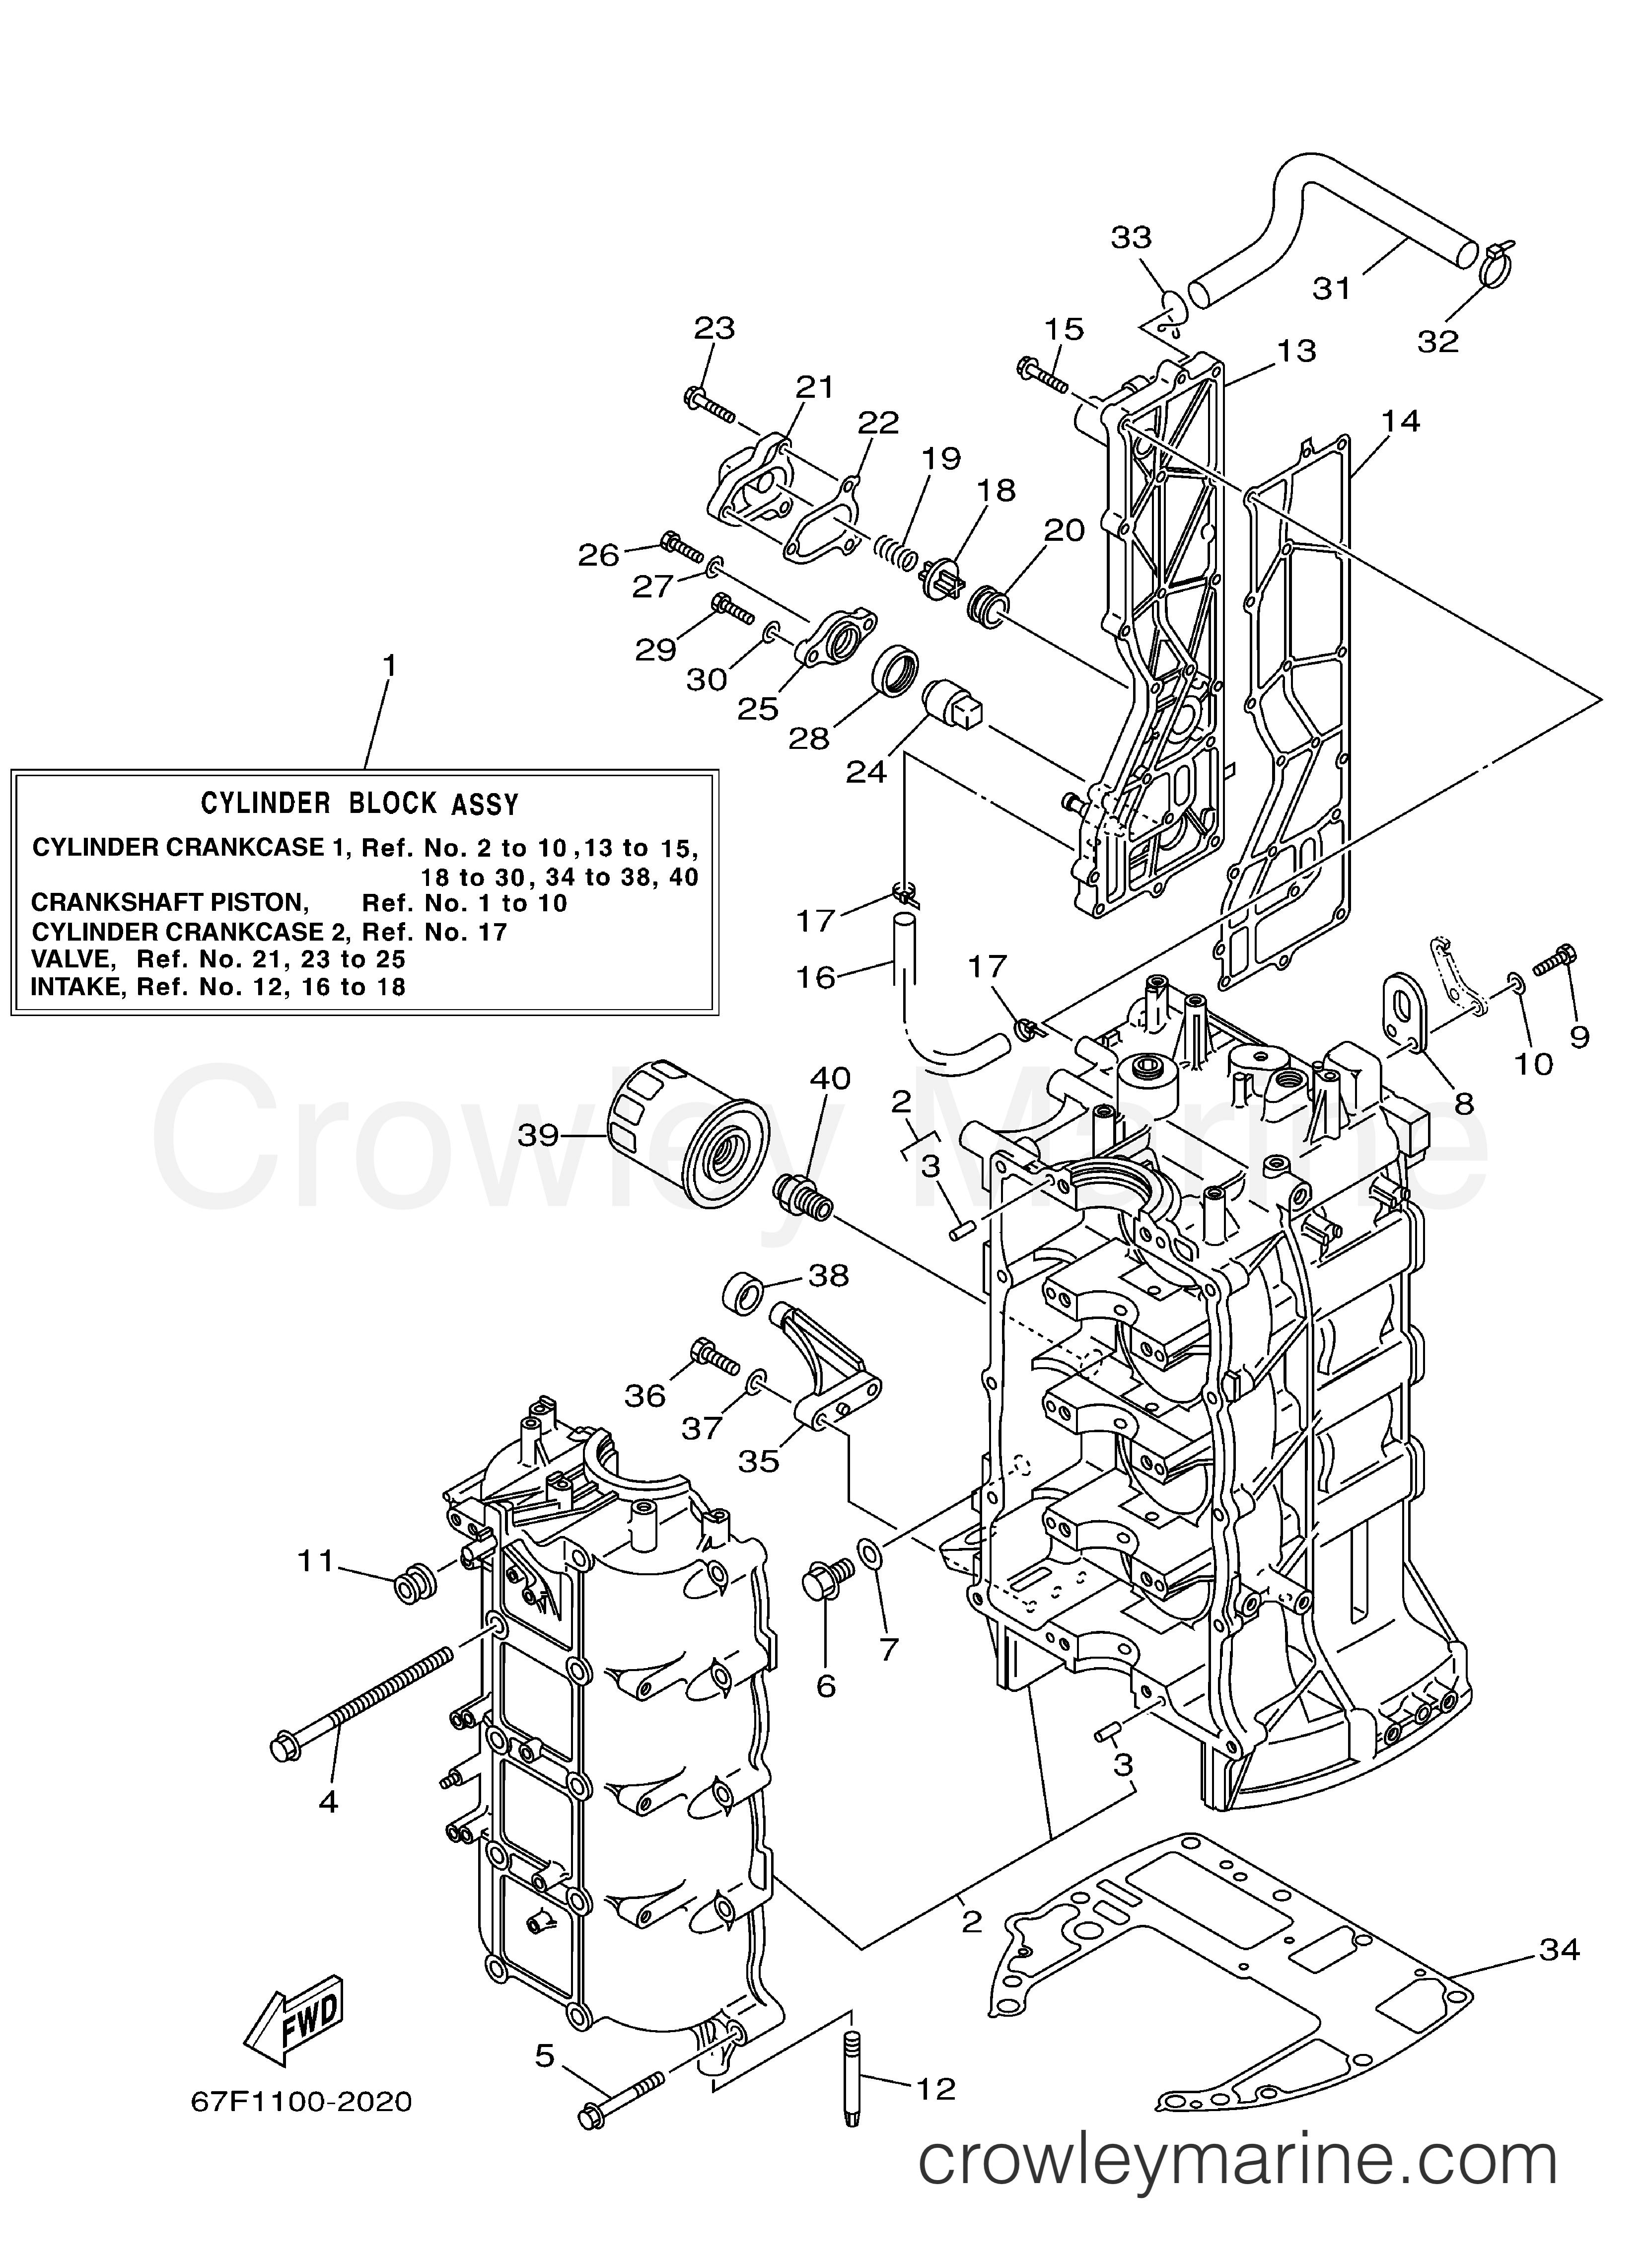 Cylinder Crankcase 1